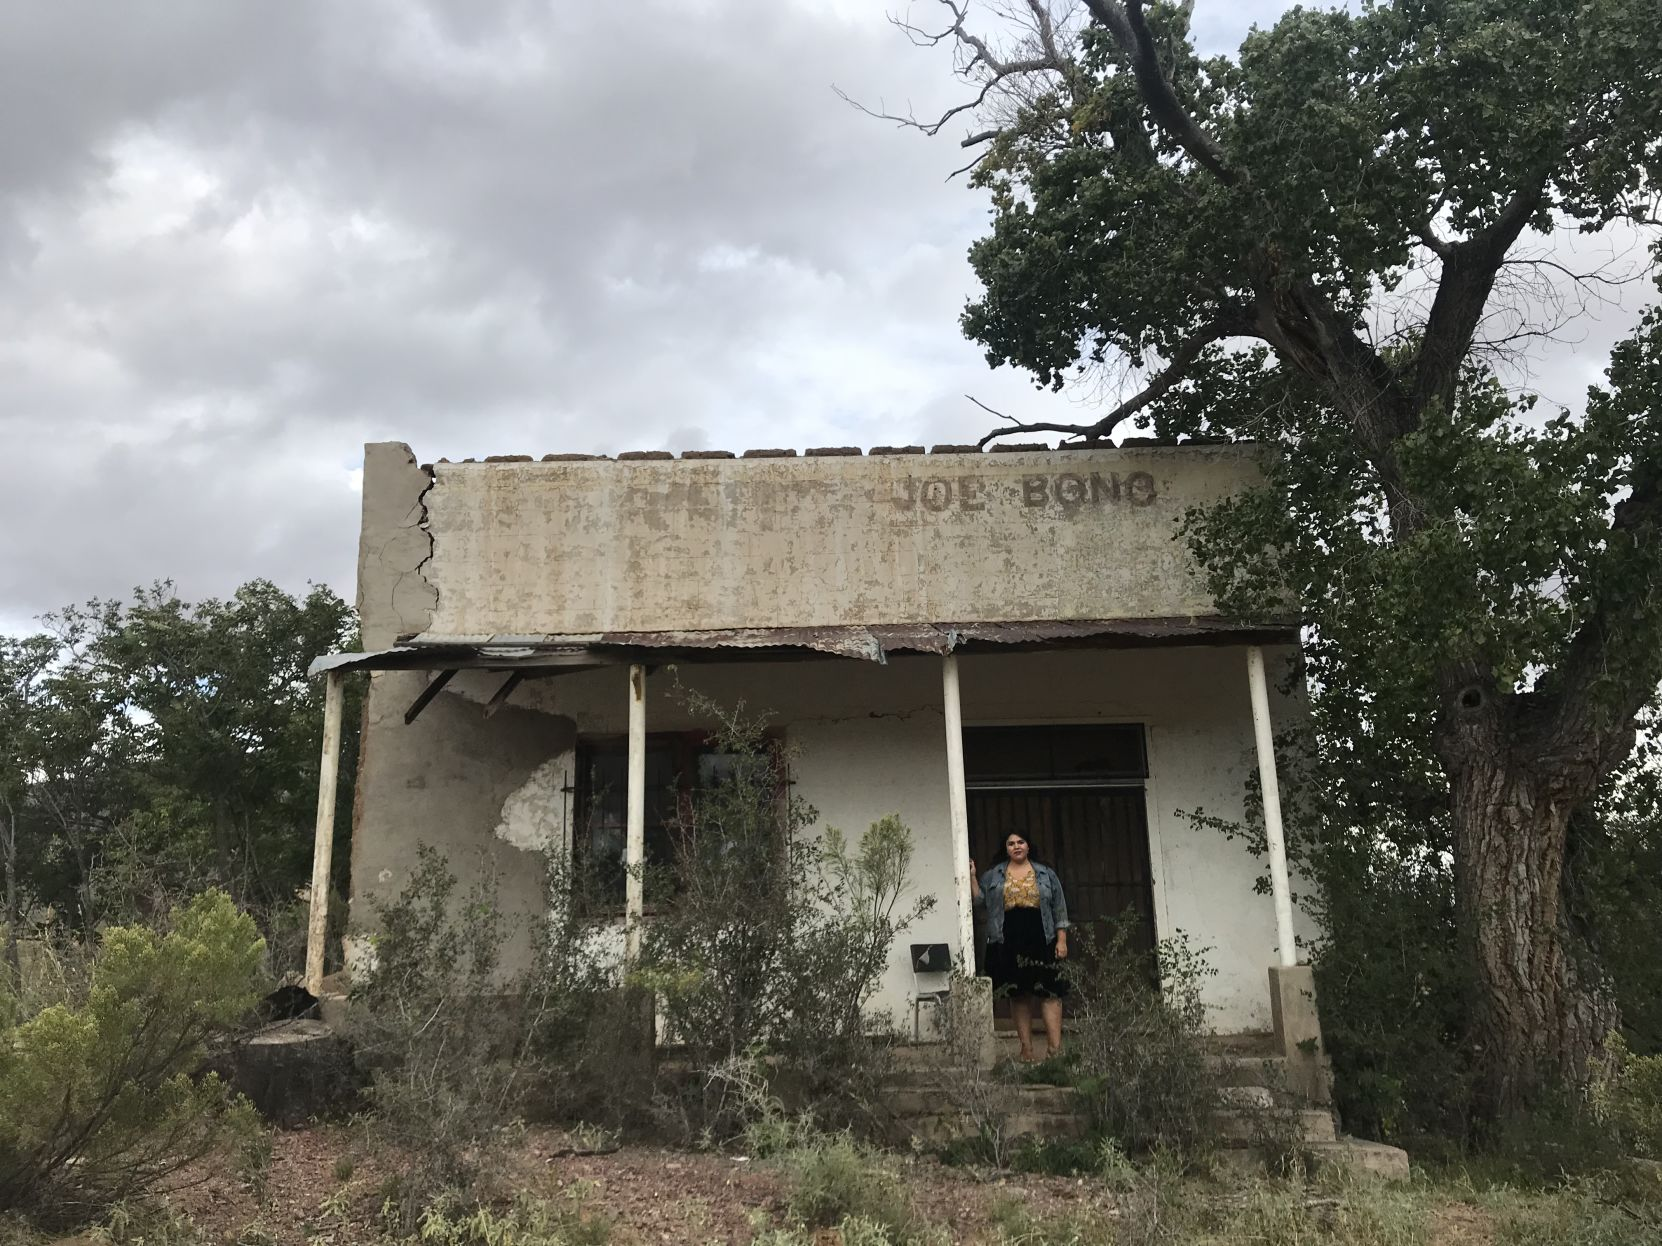 Take This Spooky Arizona Ghost Town Road Trip Tucson Life Tucson Com